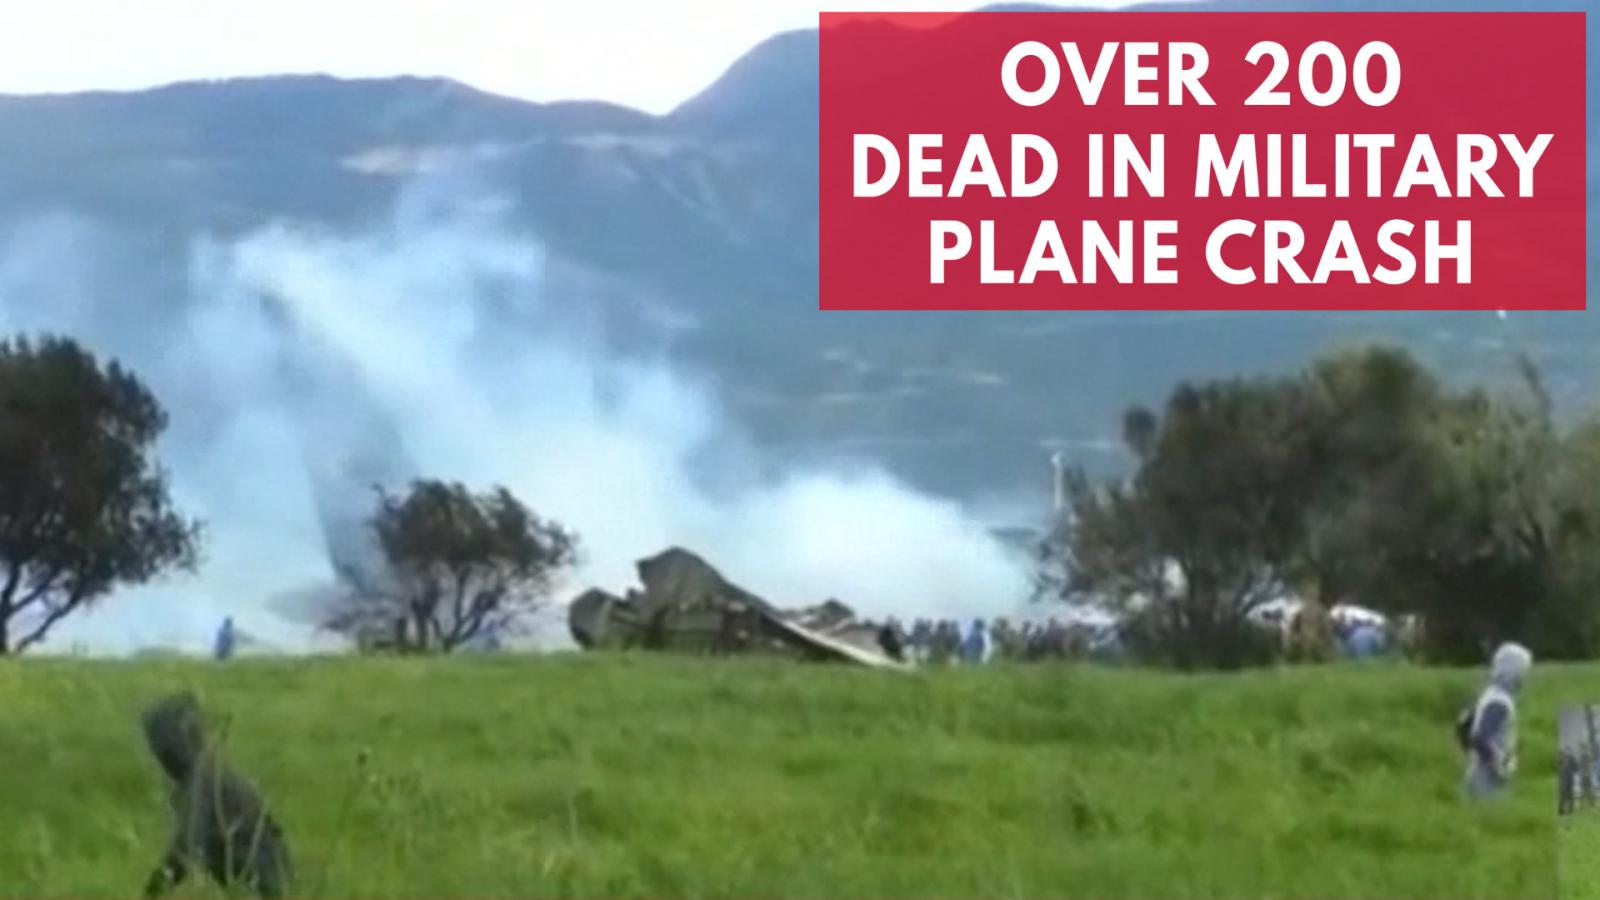 over-200-dead-in-military-plane-crash